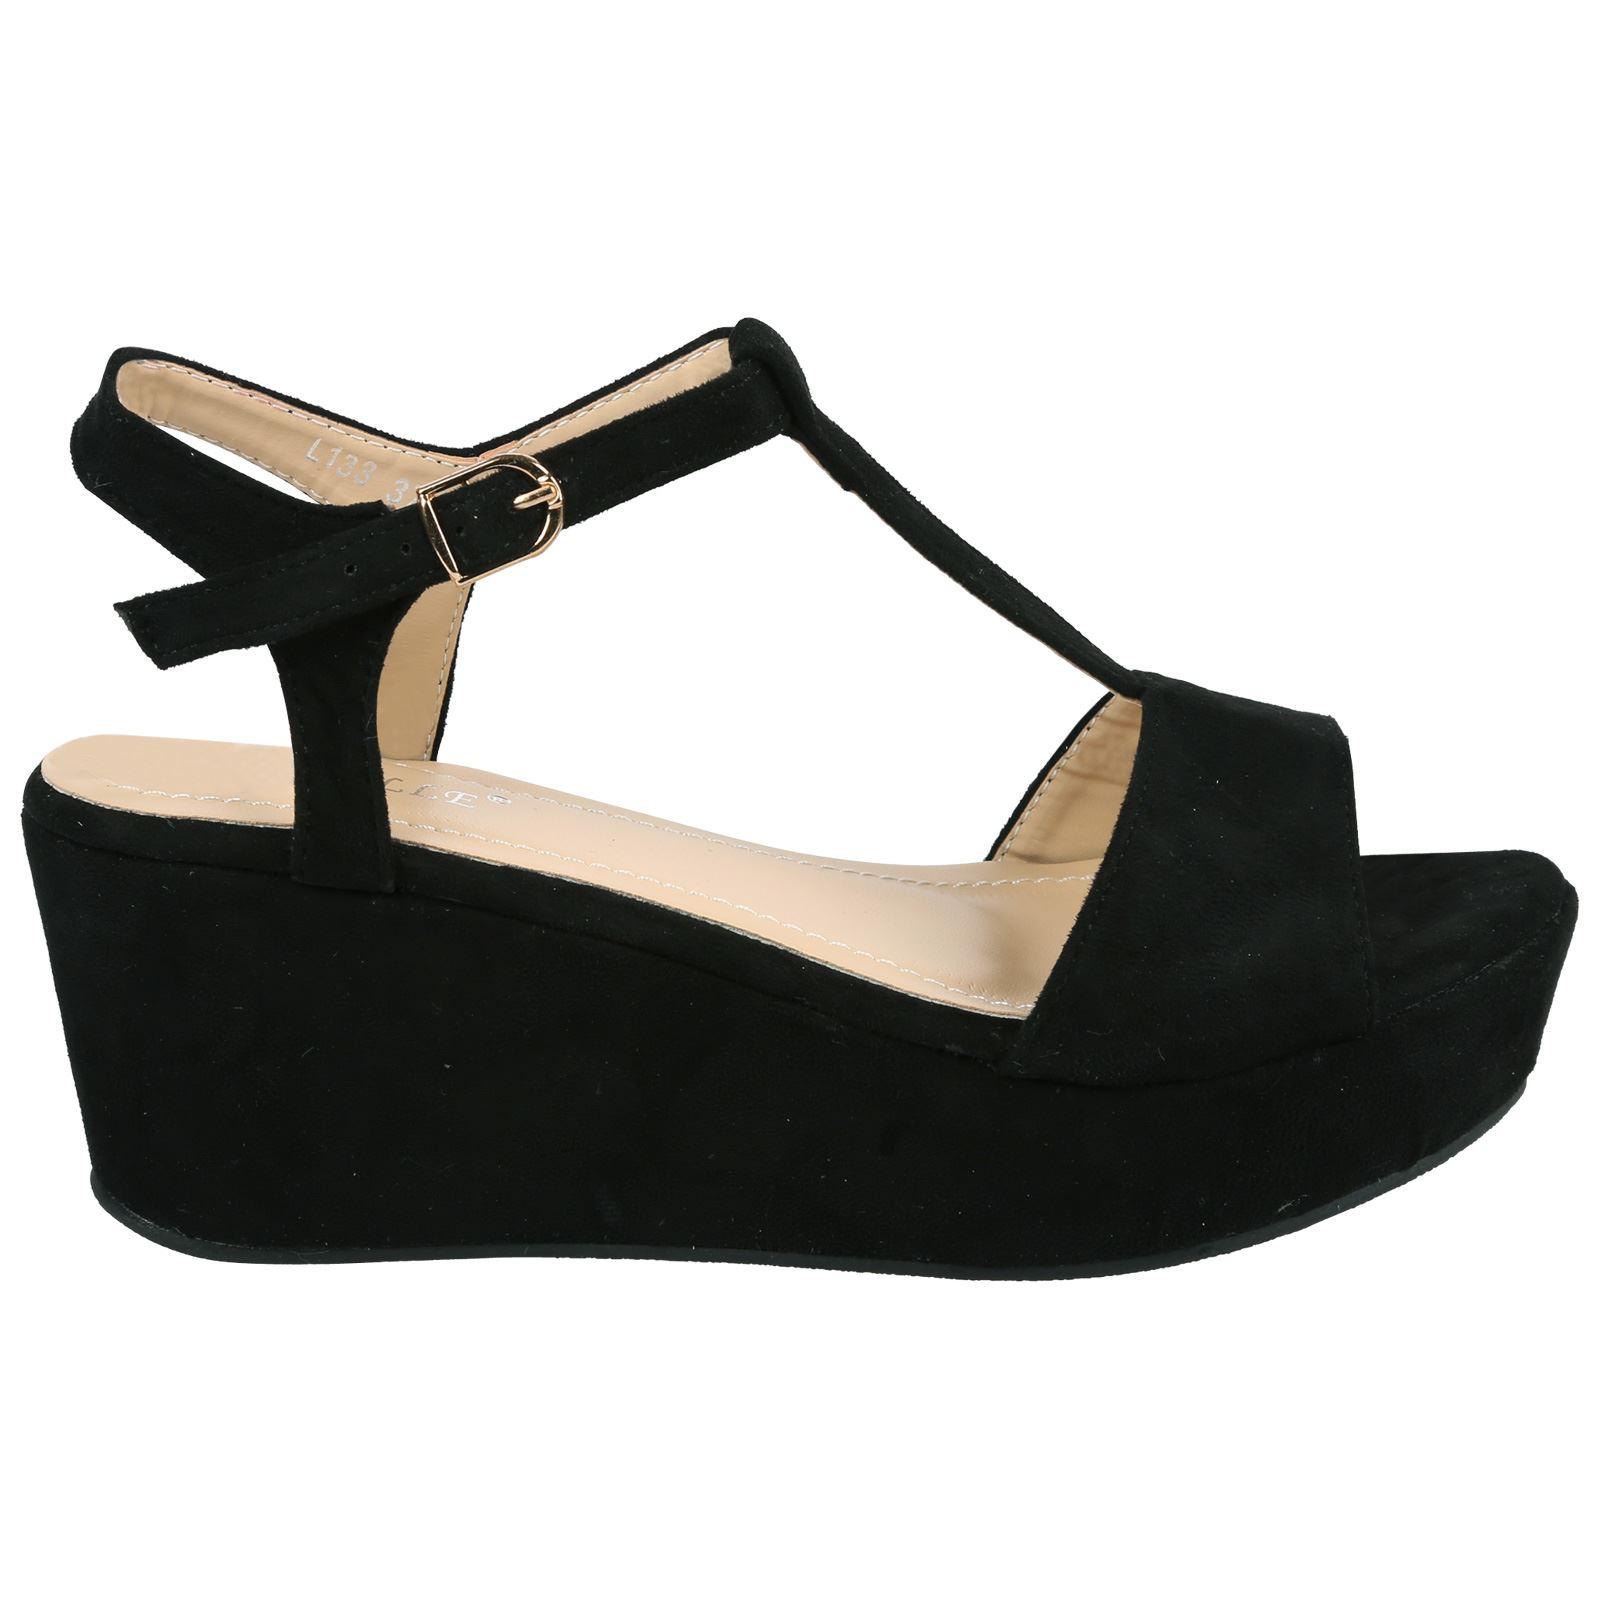 Womens Womens Diamante Mid Wedge Flip Flops Pumps Flatform Open Toe Sandals Cheap Sale Size 40